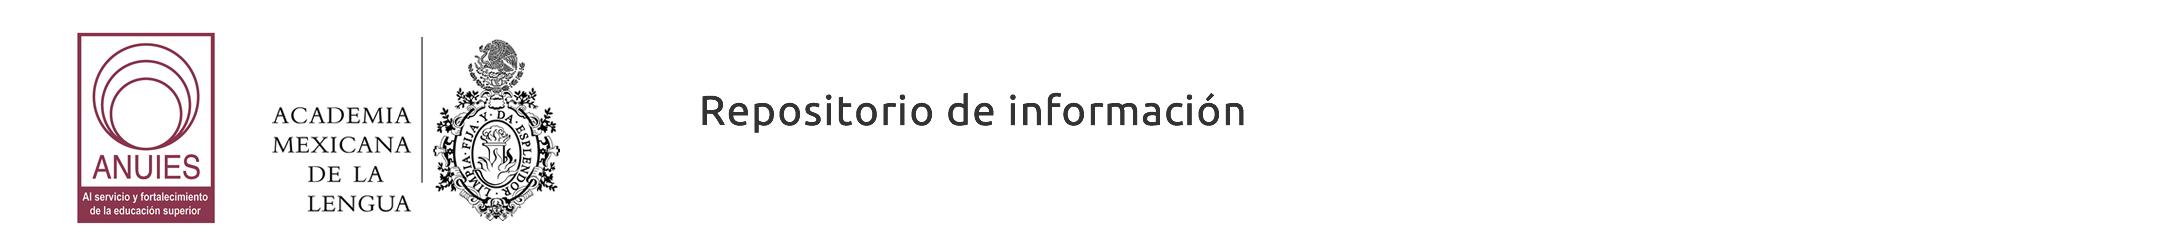 Academia Mexicana de la Lengua (AML)